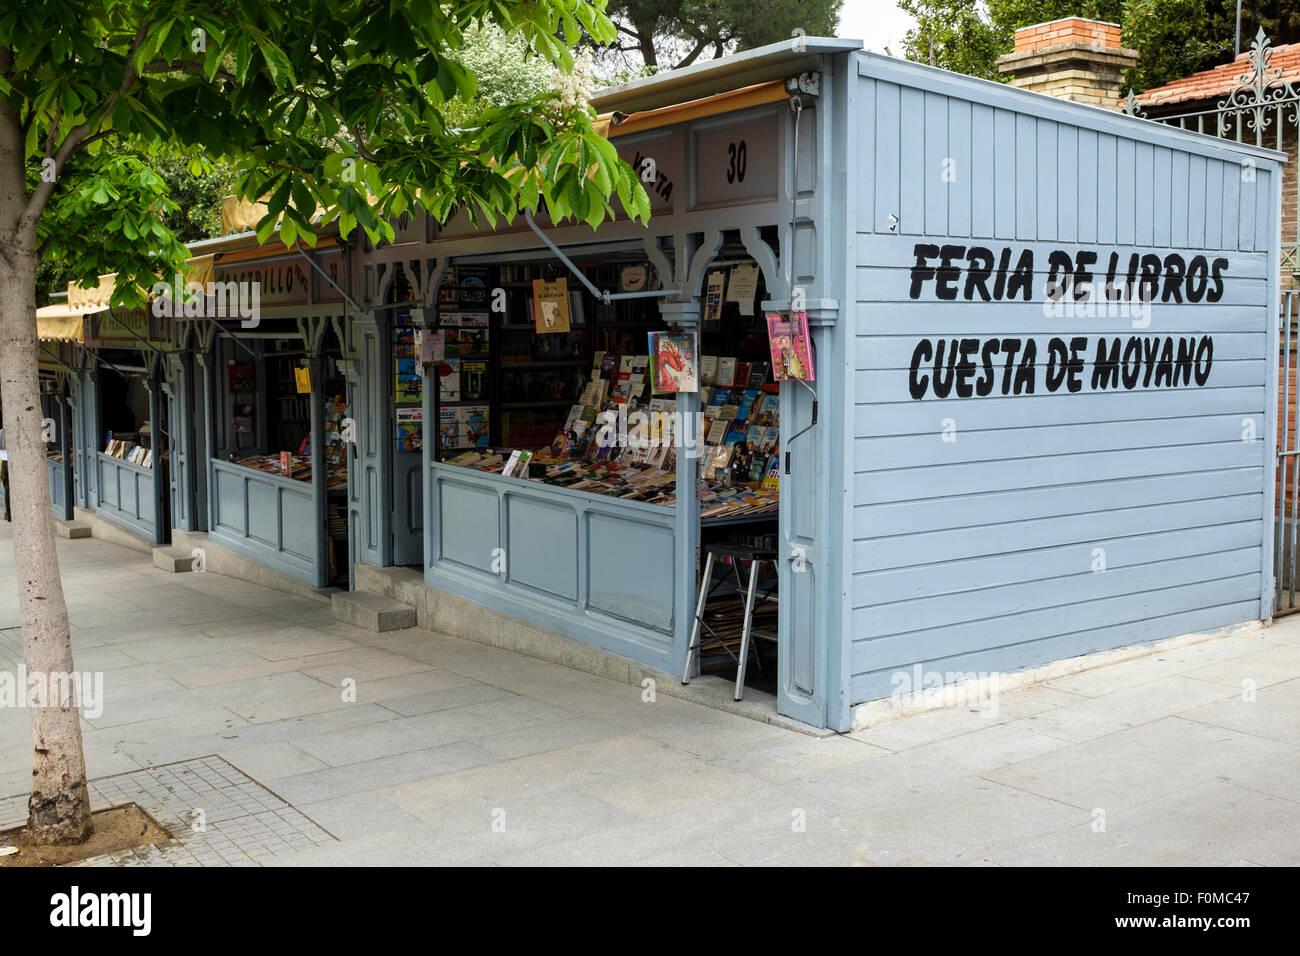 The Cuesta de Moyano, Book Fair, in Madrid Spain. - Stock Image